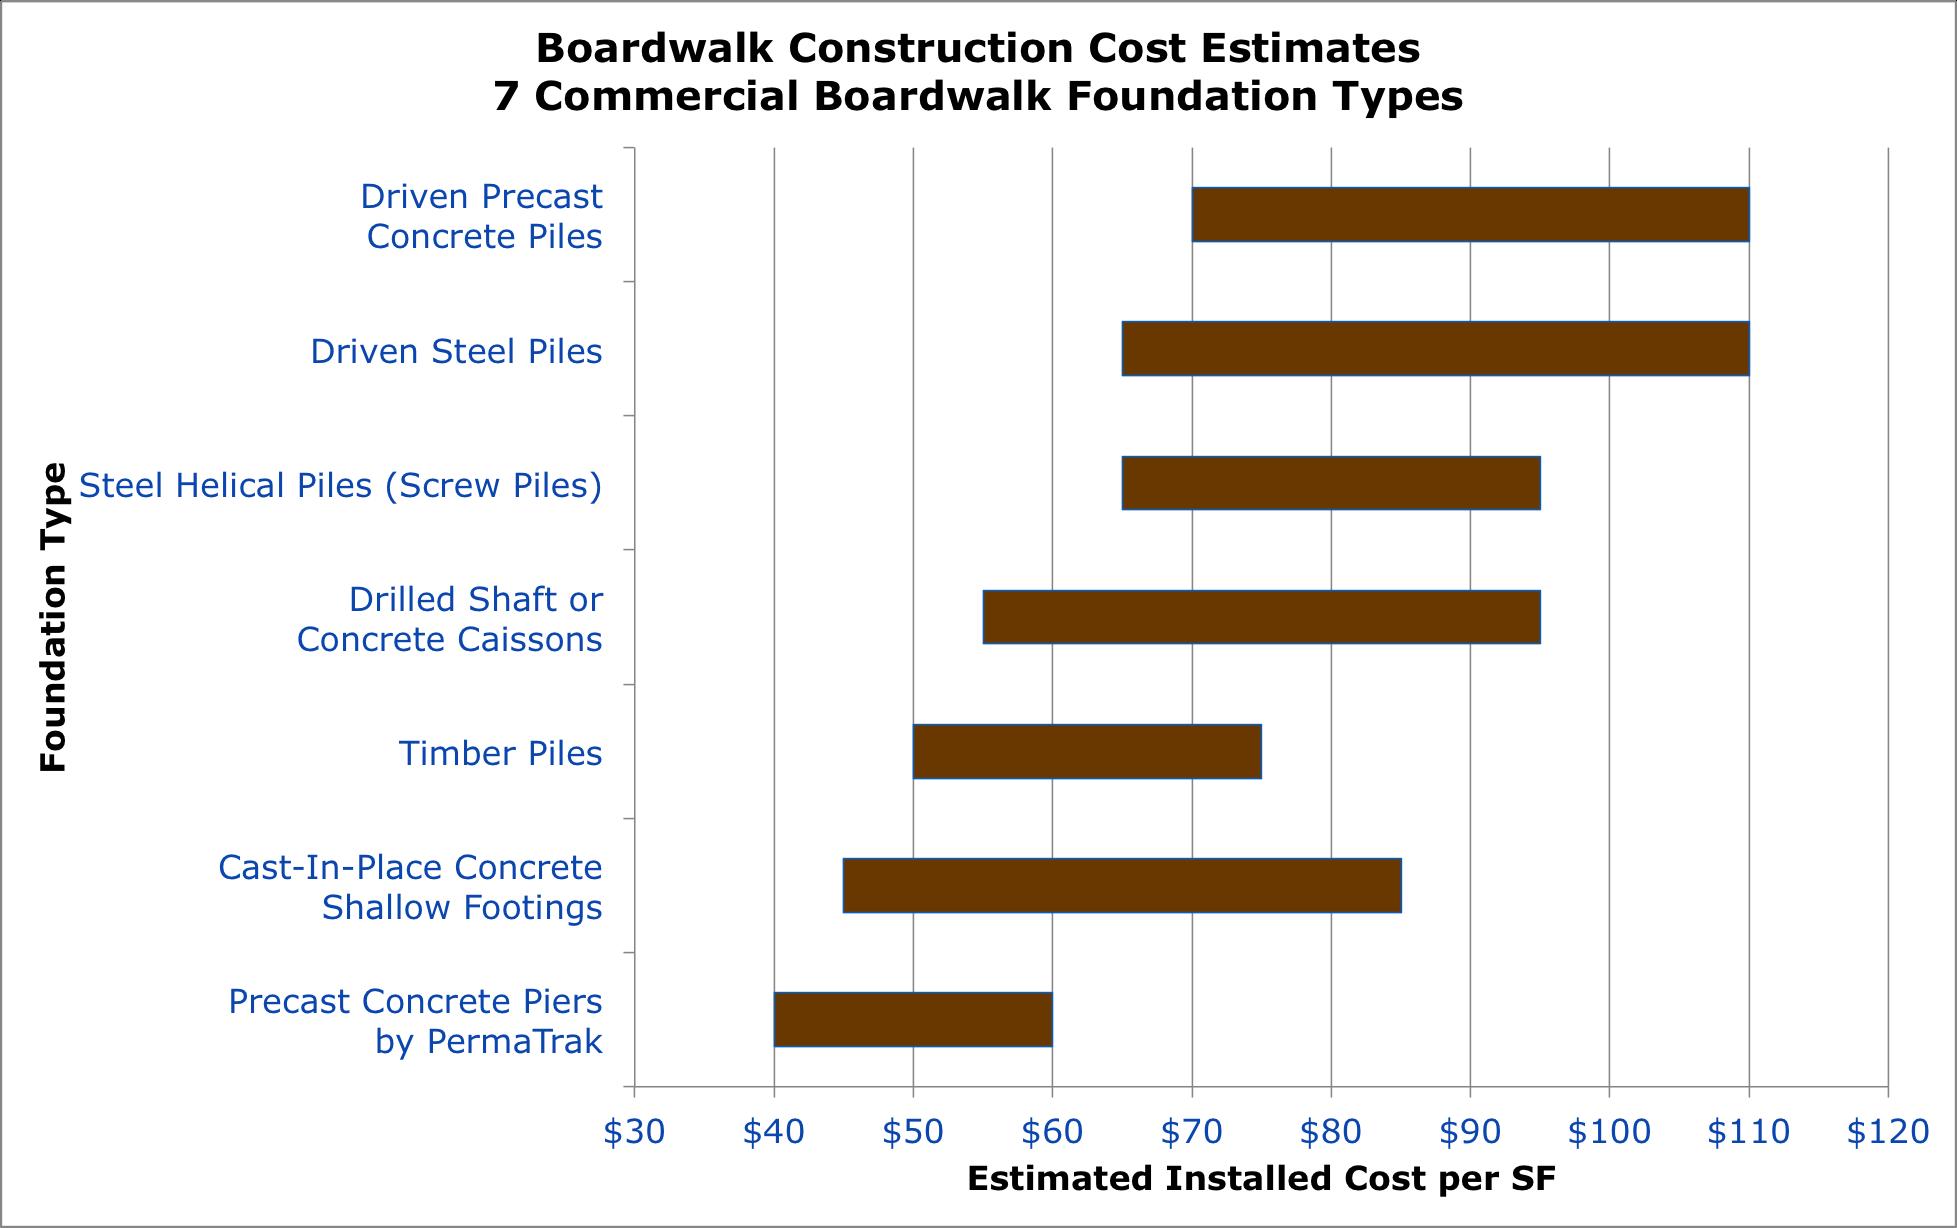 boardwalk construction estimates how much does a boardwalk cost?